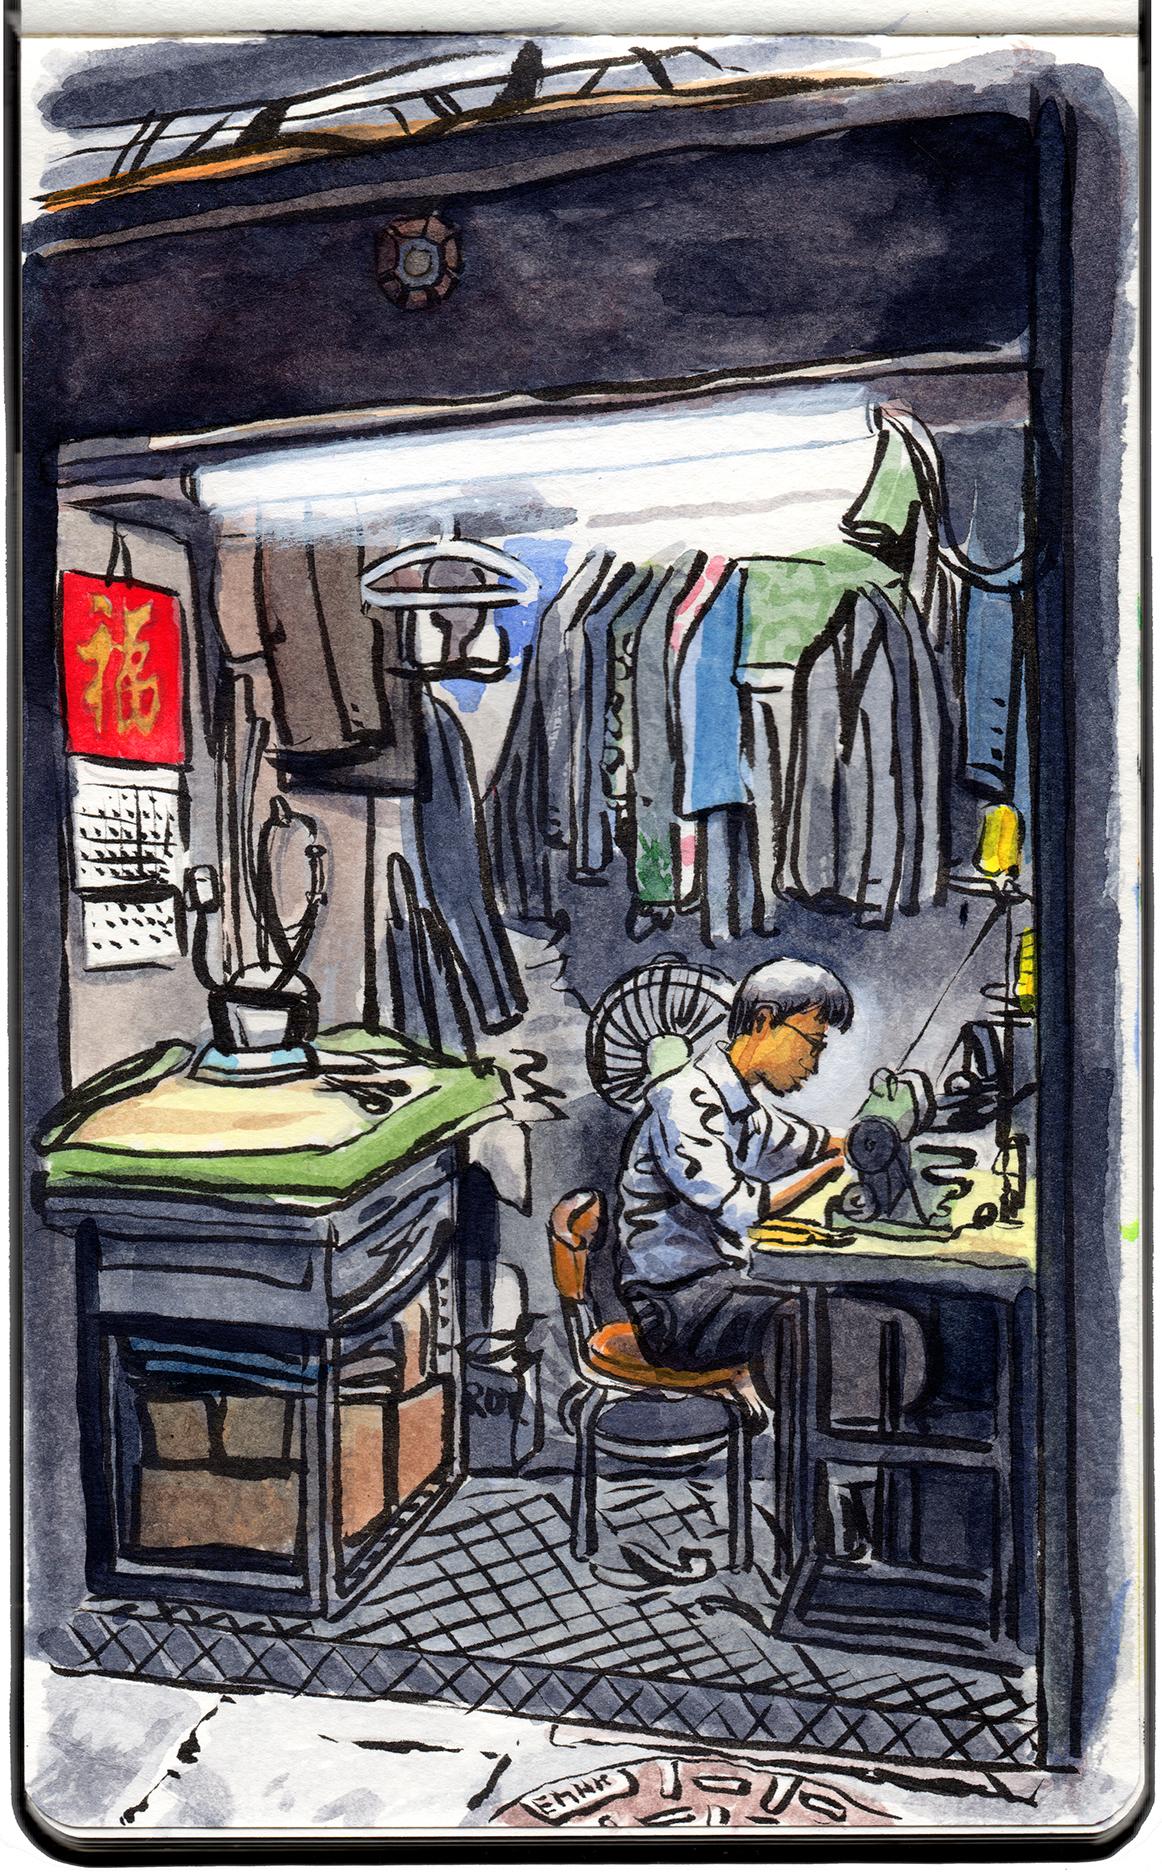 Tailor, East TST.